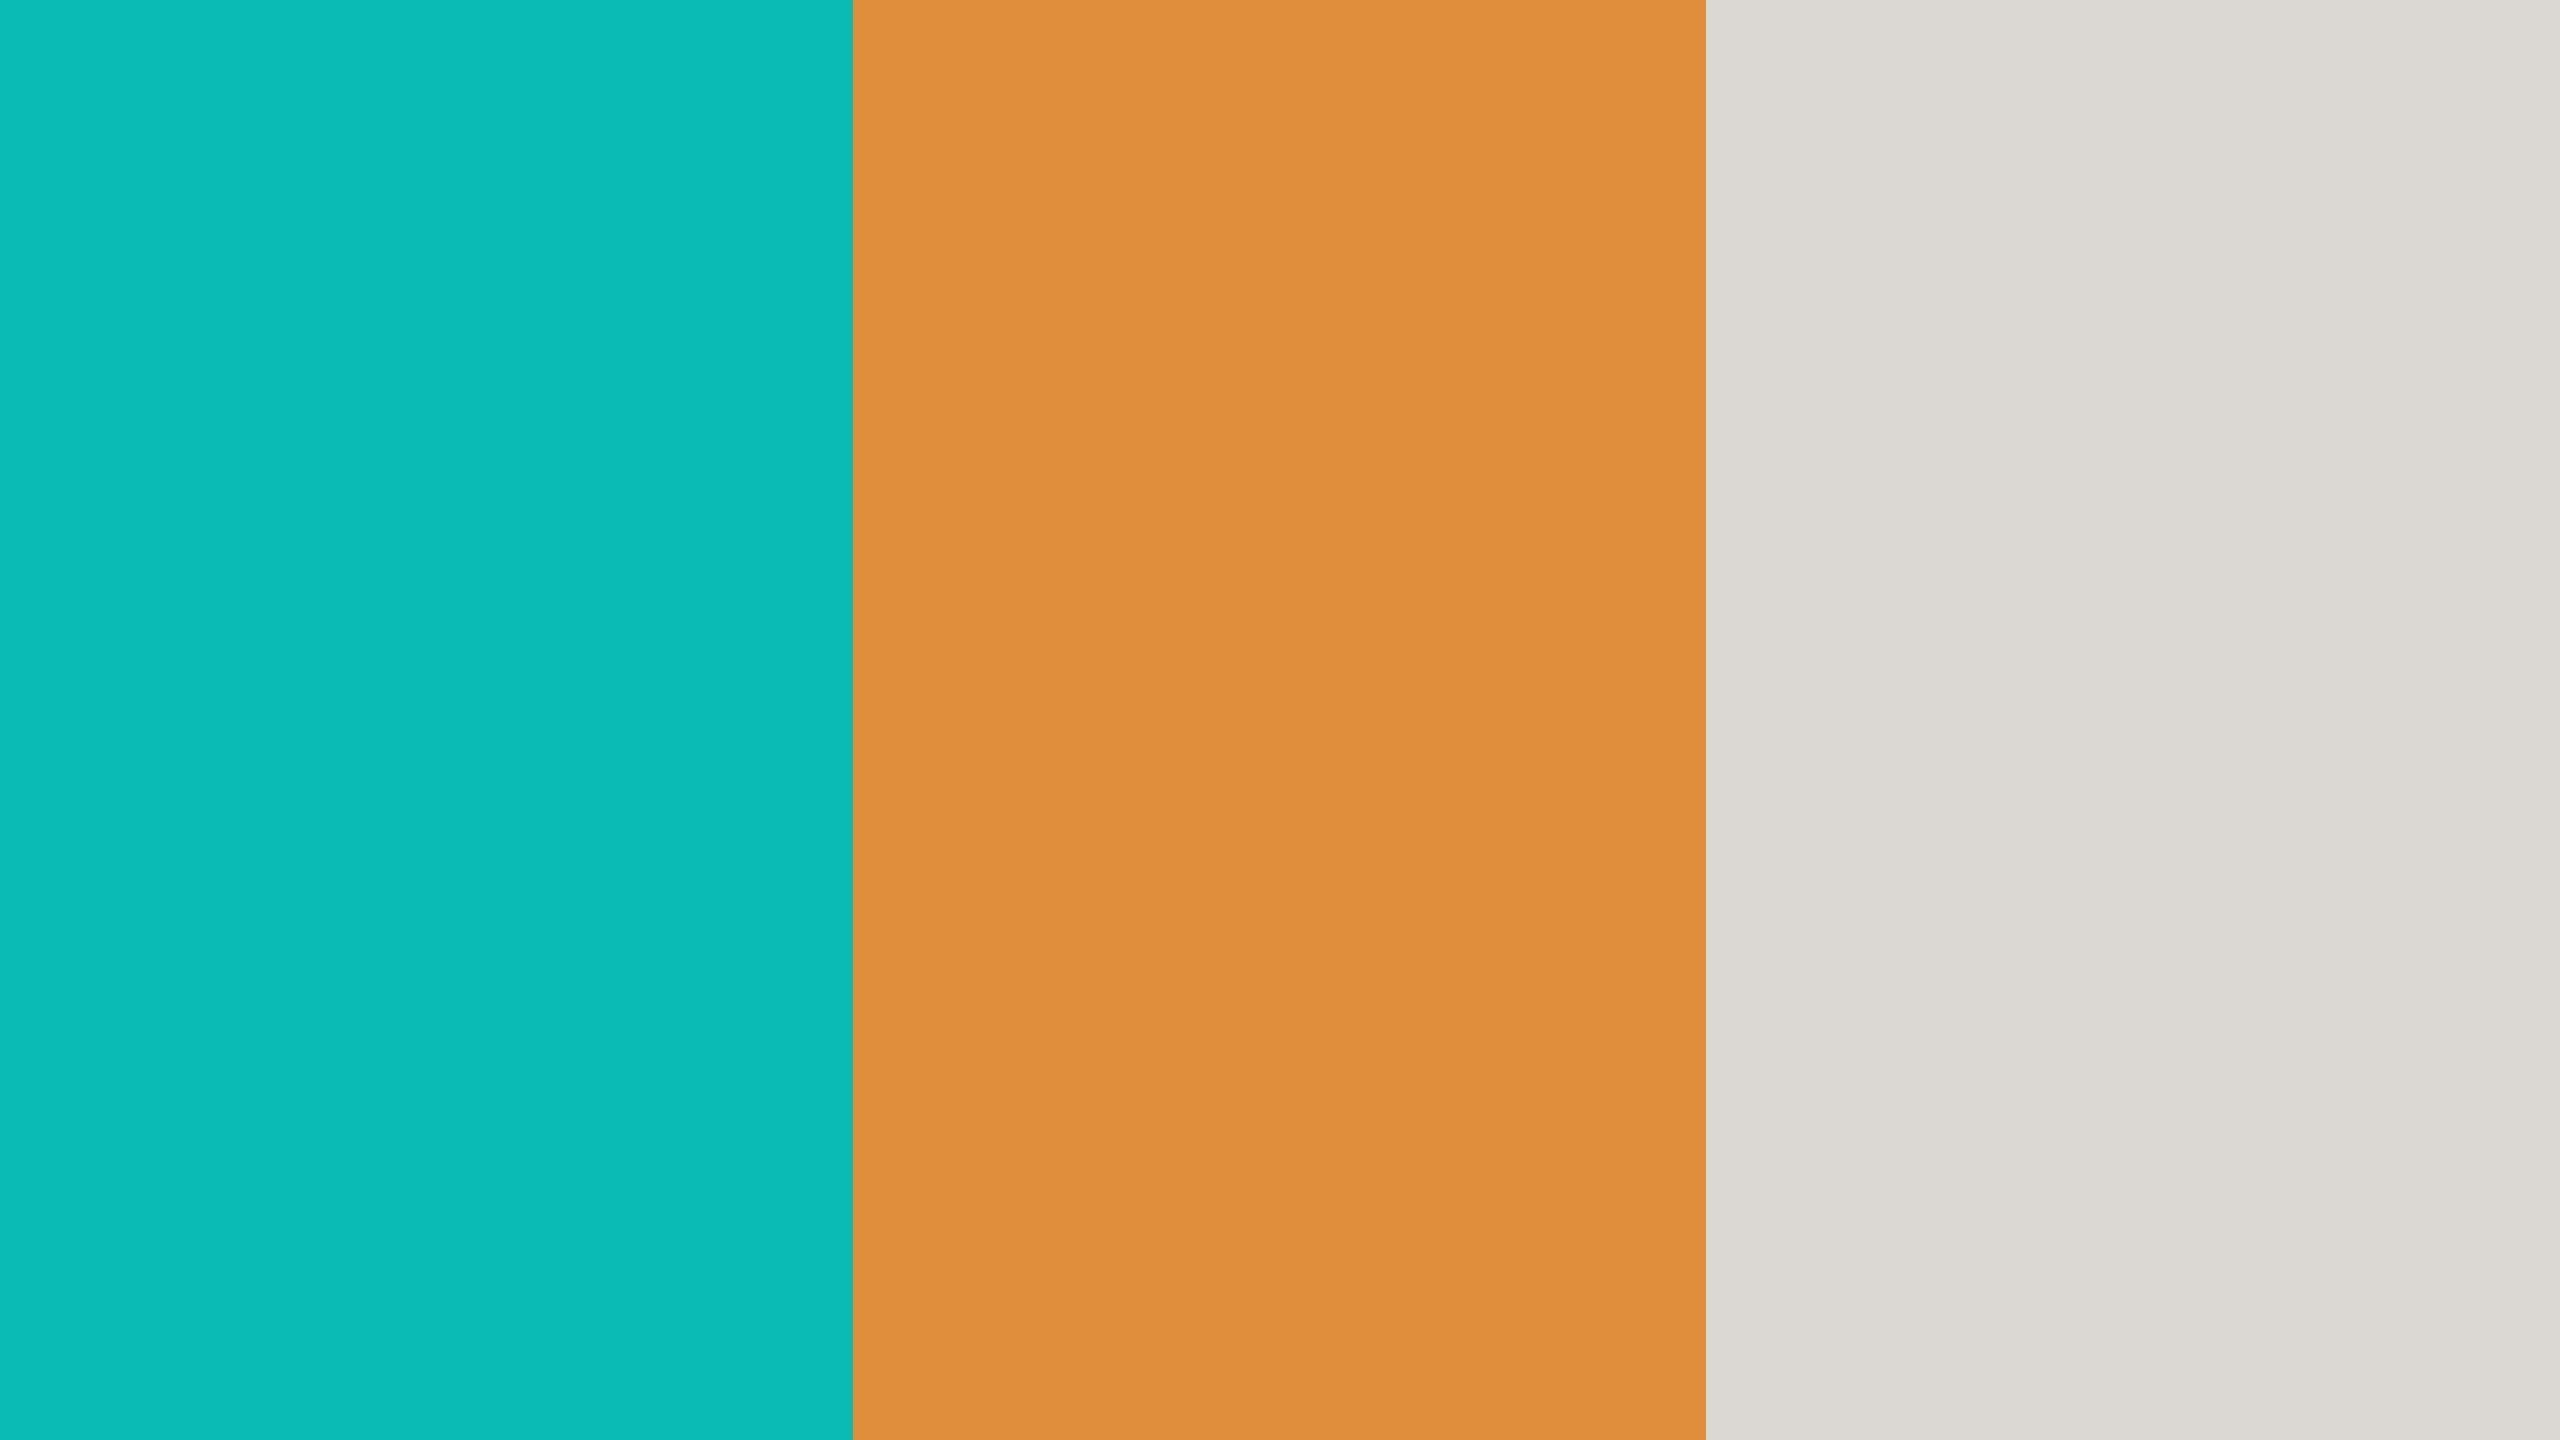 2560×1440-tiffany-blue-tigers-eye-timberwolf-three-color-